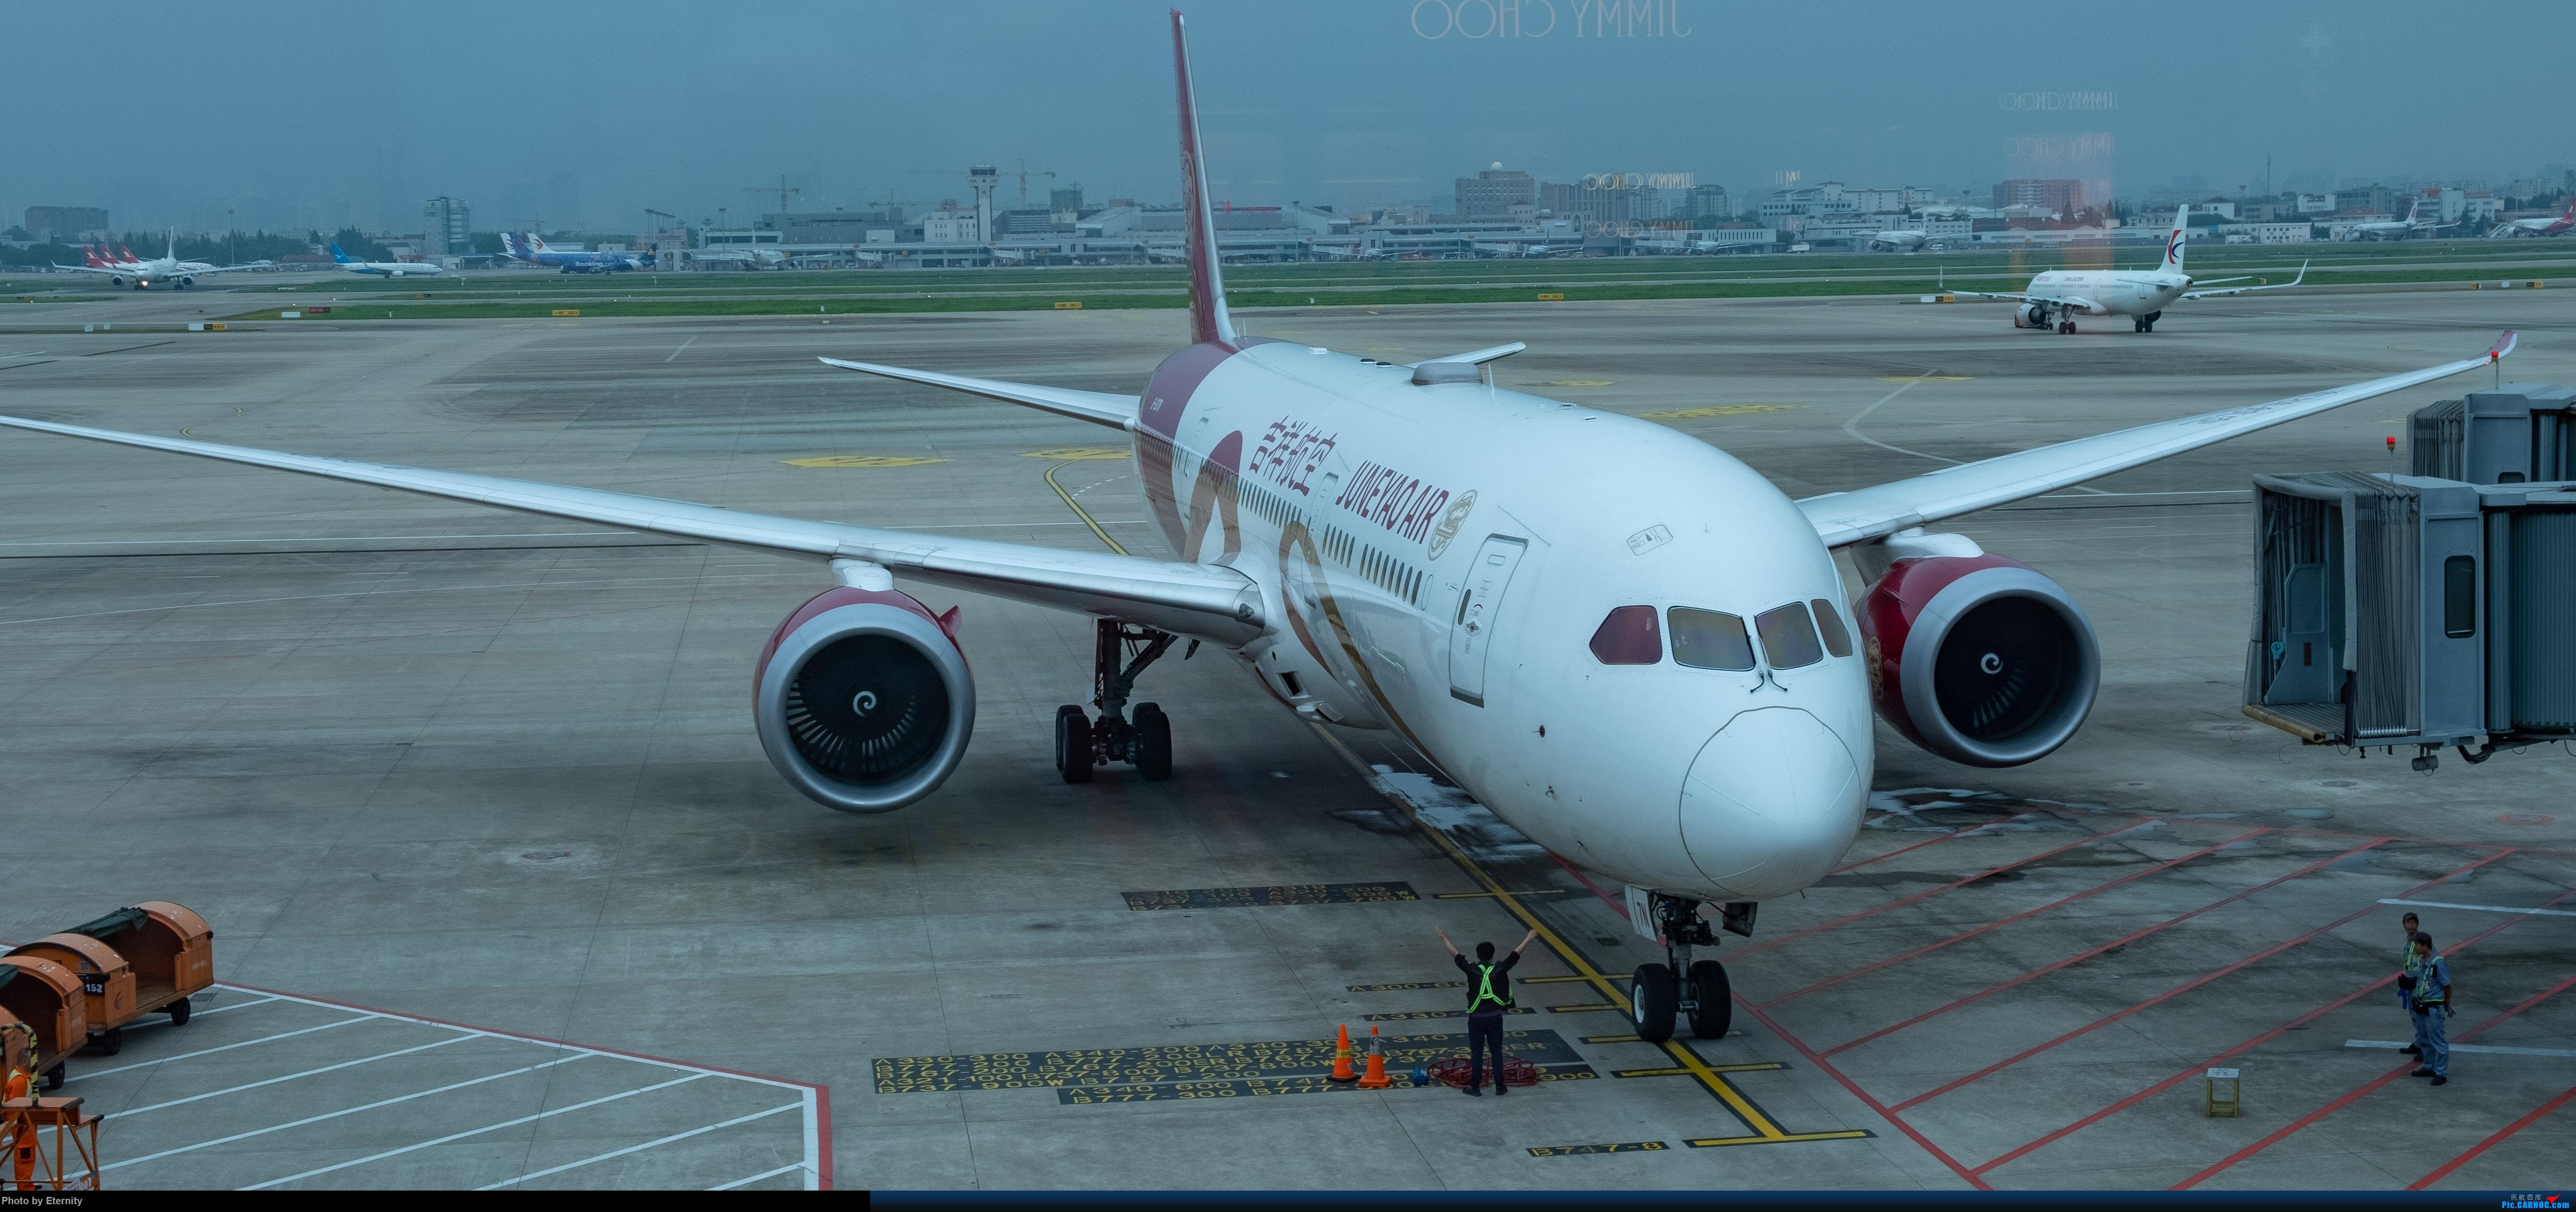 Re:[原创]后疫情期间的暑假国内游 | 西安-上海-广州-成都 | 体验国内3条干线 | 吉祥航空787 | 南航350 | 海航737 BOEING 787-9 B-207N 中国上海虹桥国际机场